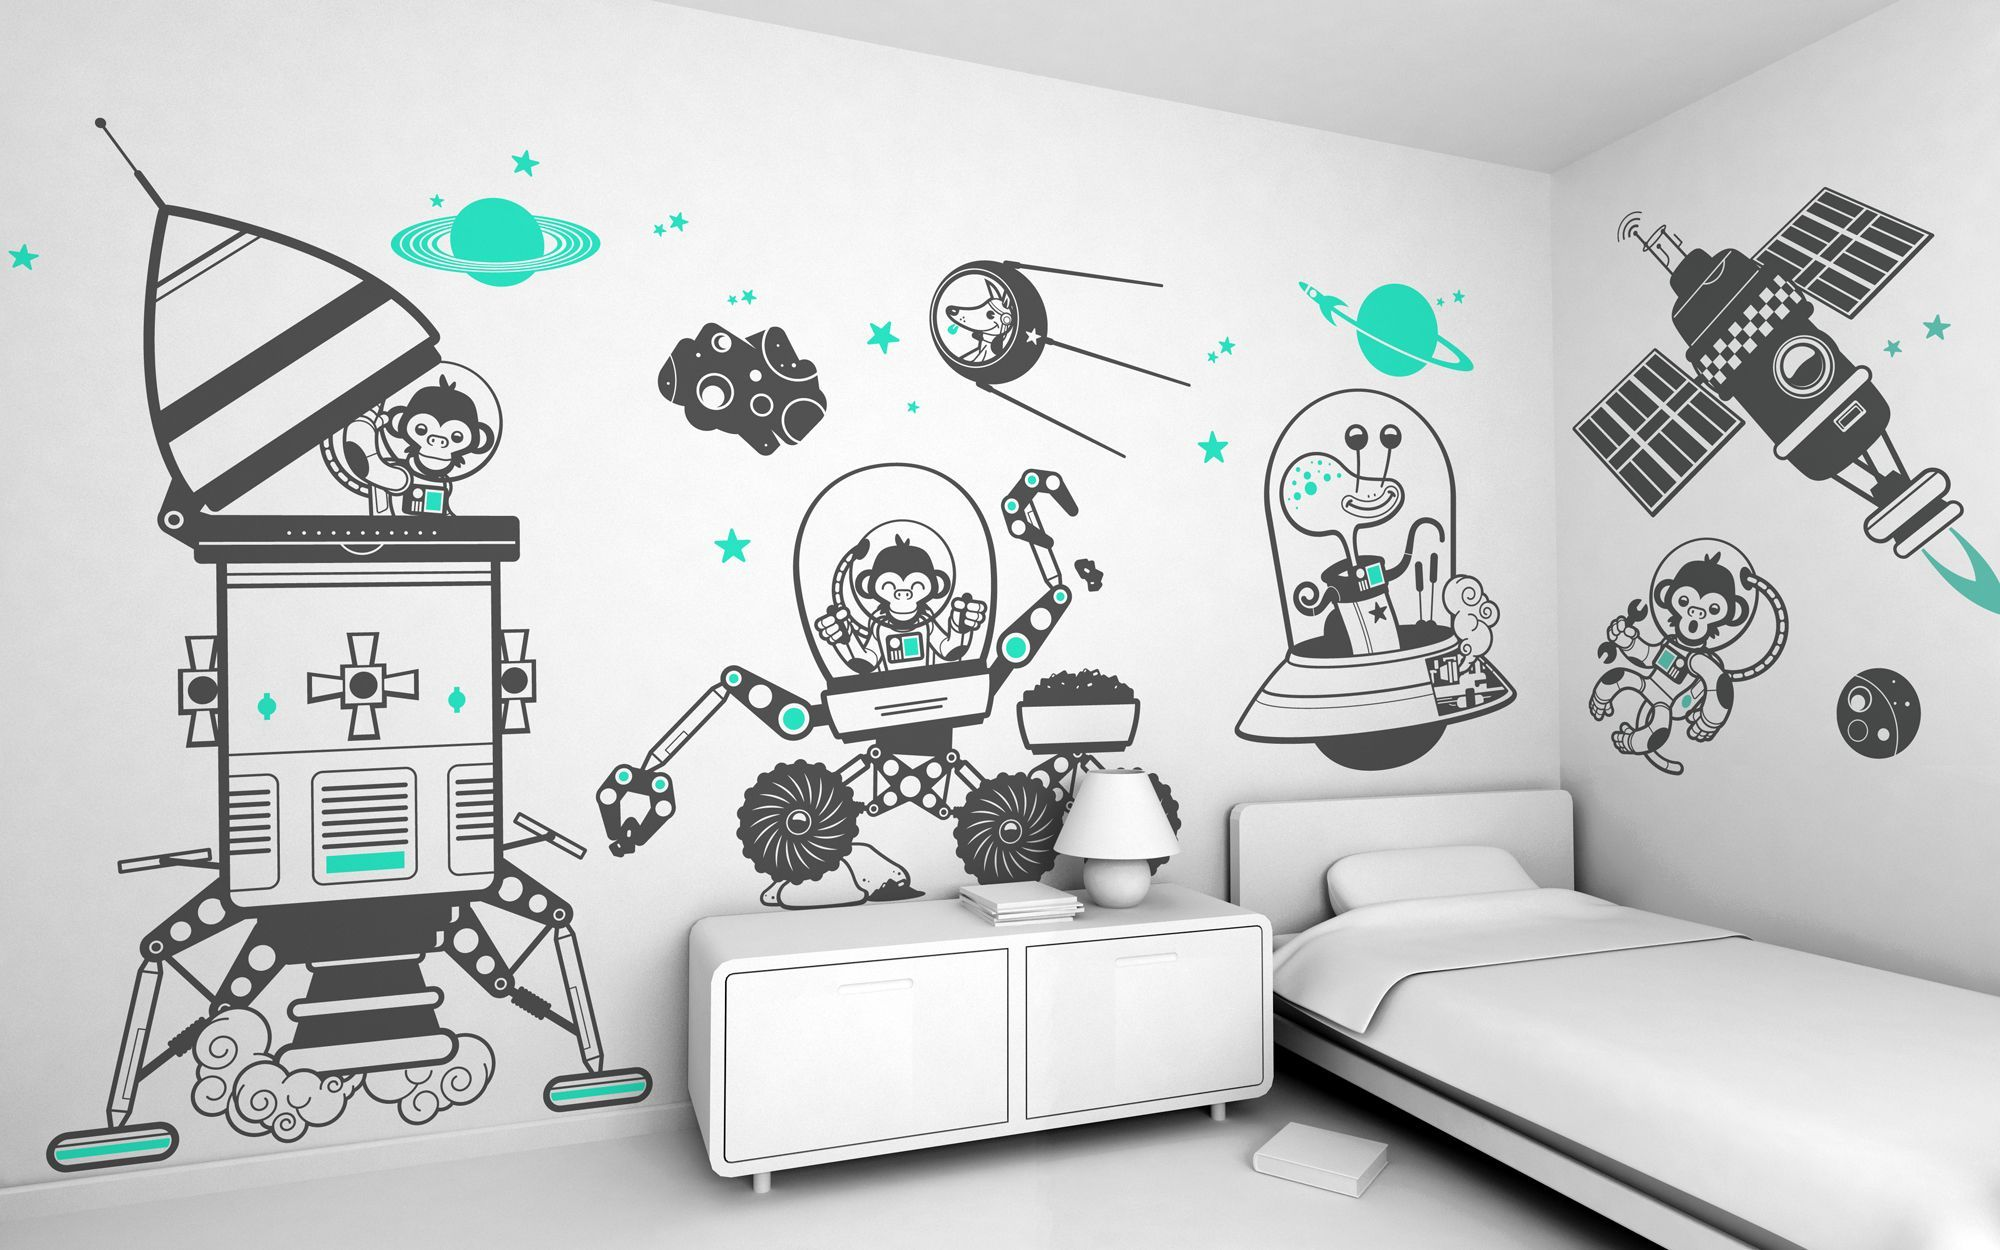 wall art decoration - Google Search   Store Idea   Pinterest ...